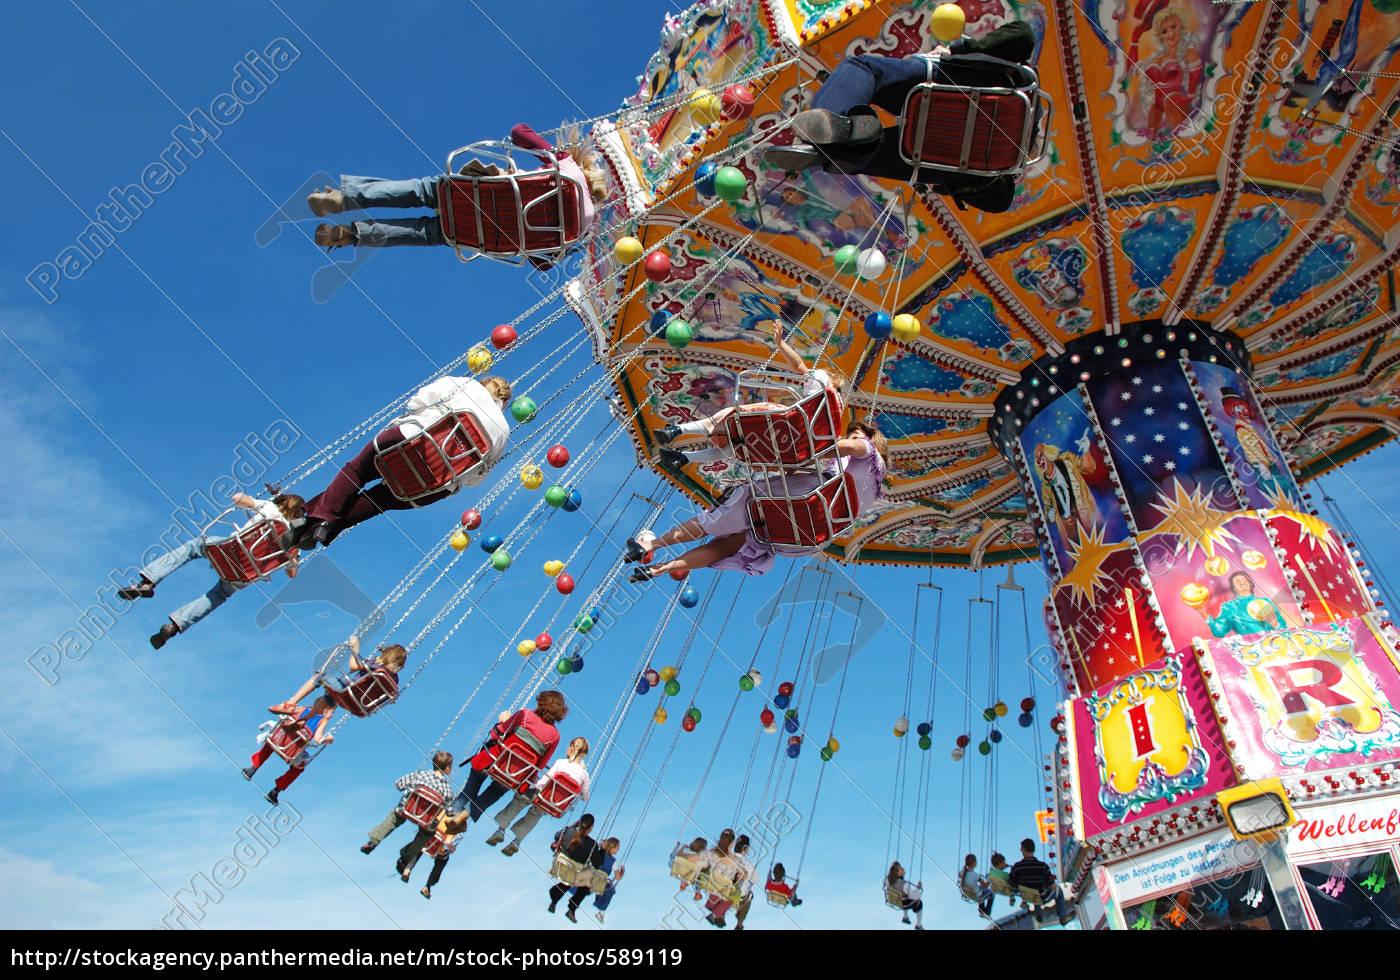 carousel - 589119